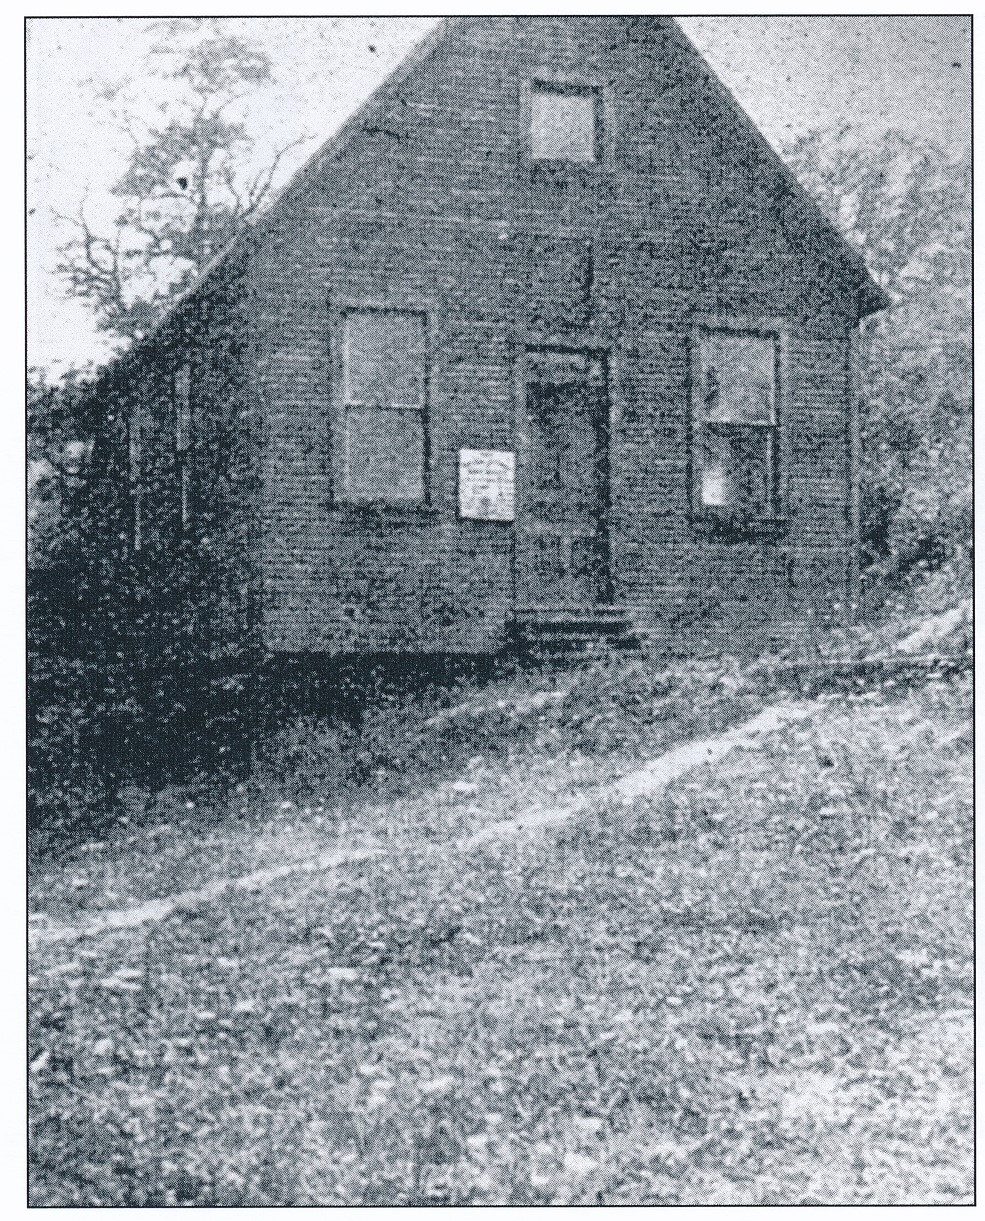 Mount Olive Baptist Church - Maple & Vance.jpg